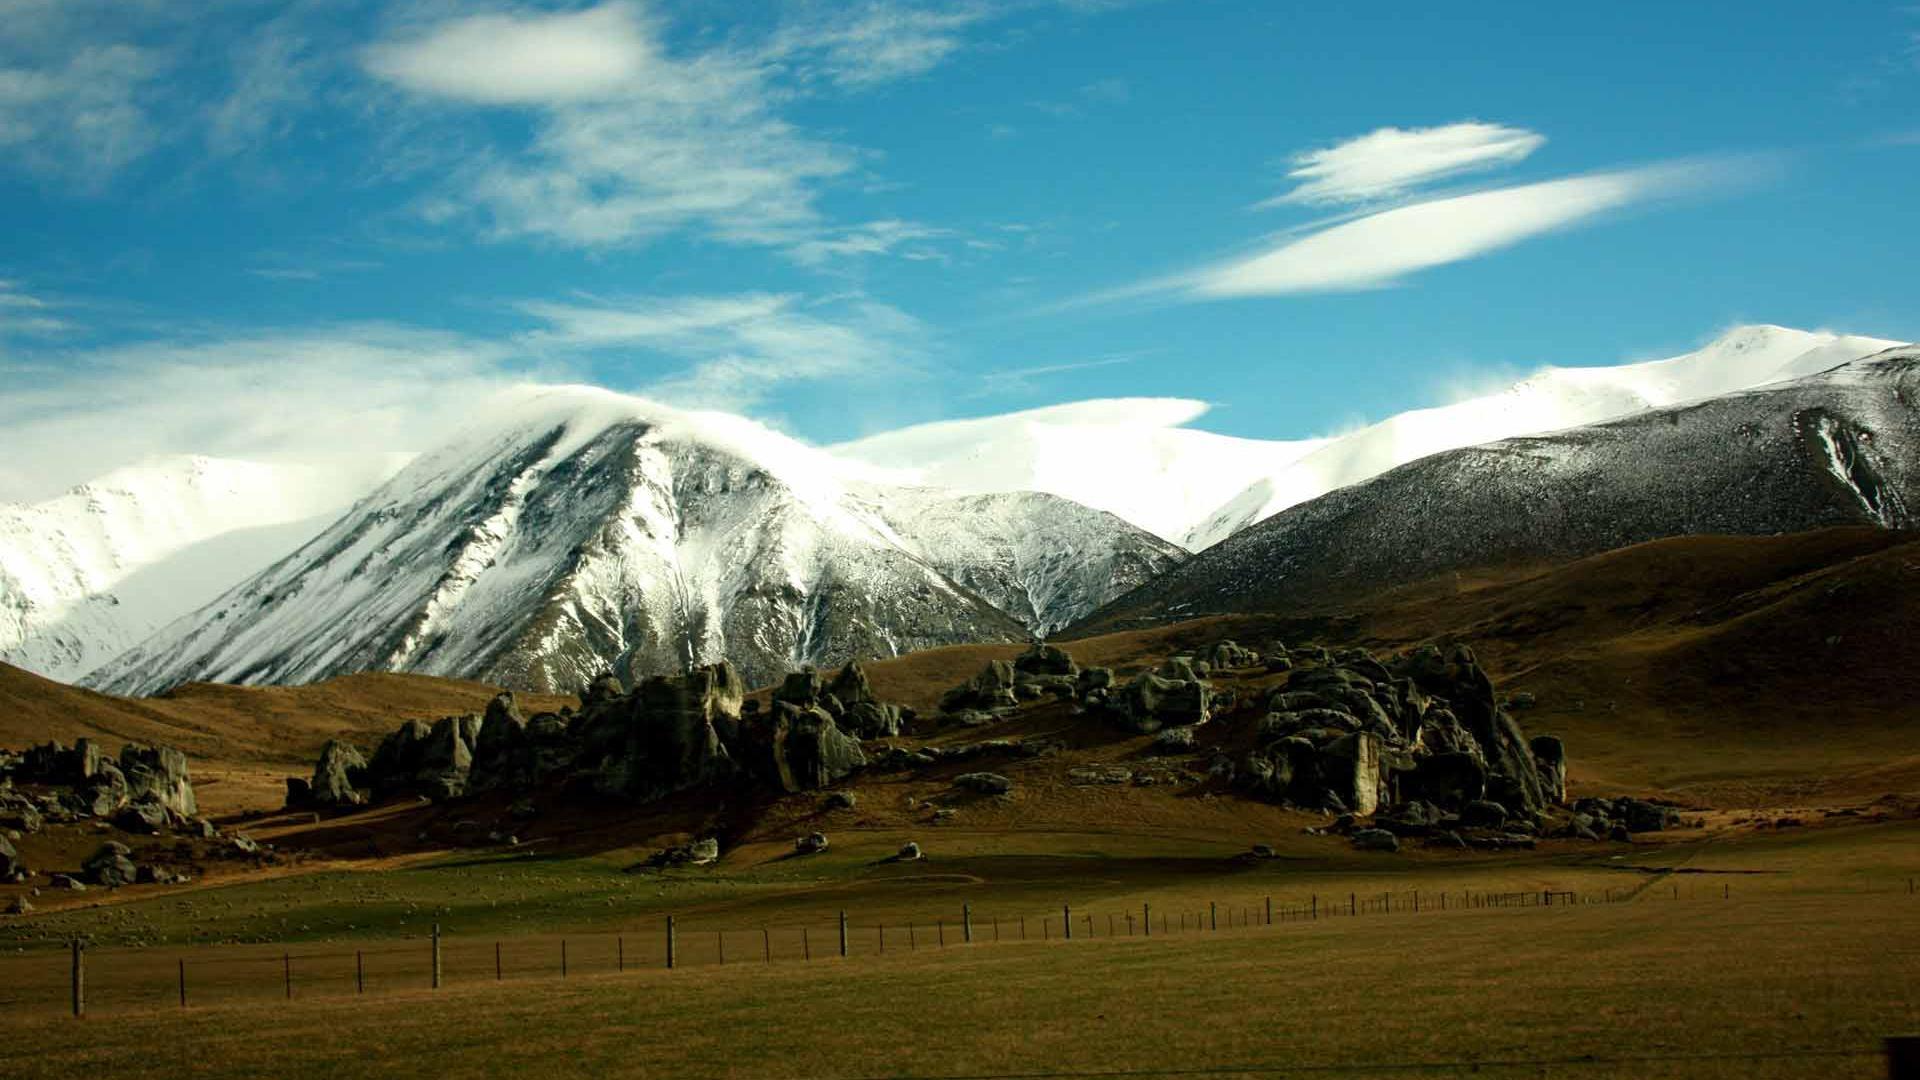 Snow Scenes Mountain Landscape   1920x1080px    154008 218 94 KB HD Wallpaper